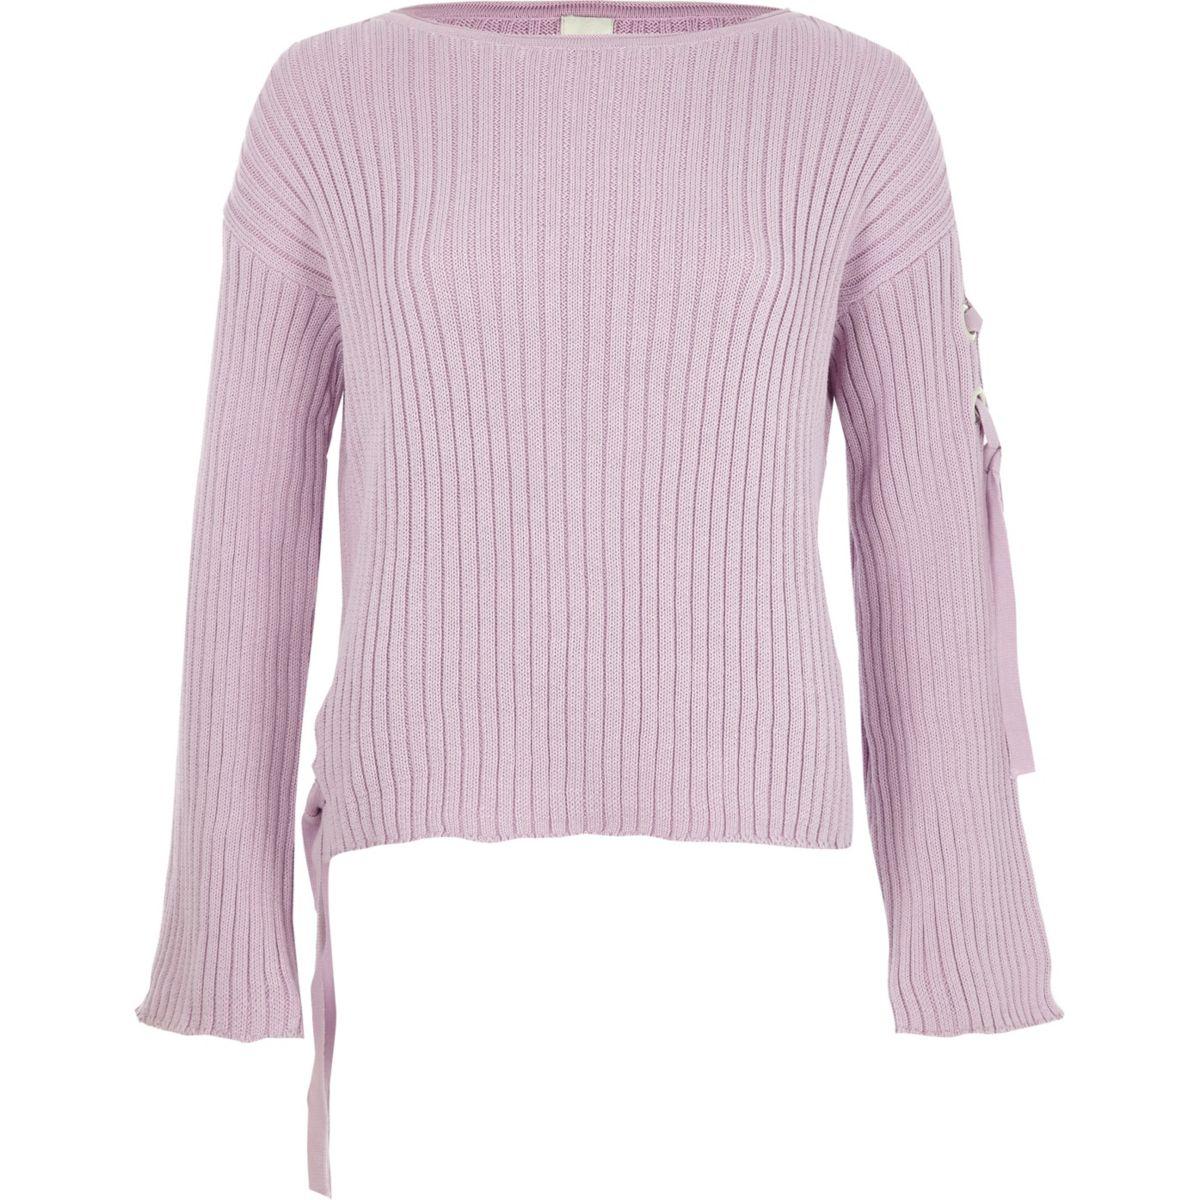 Light purple rib knit tie side sweater